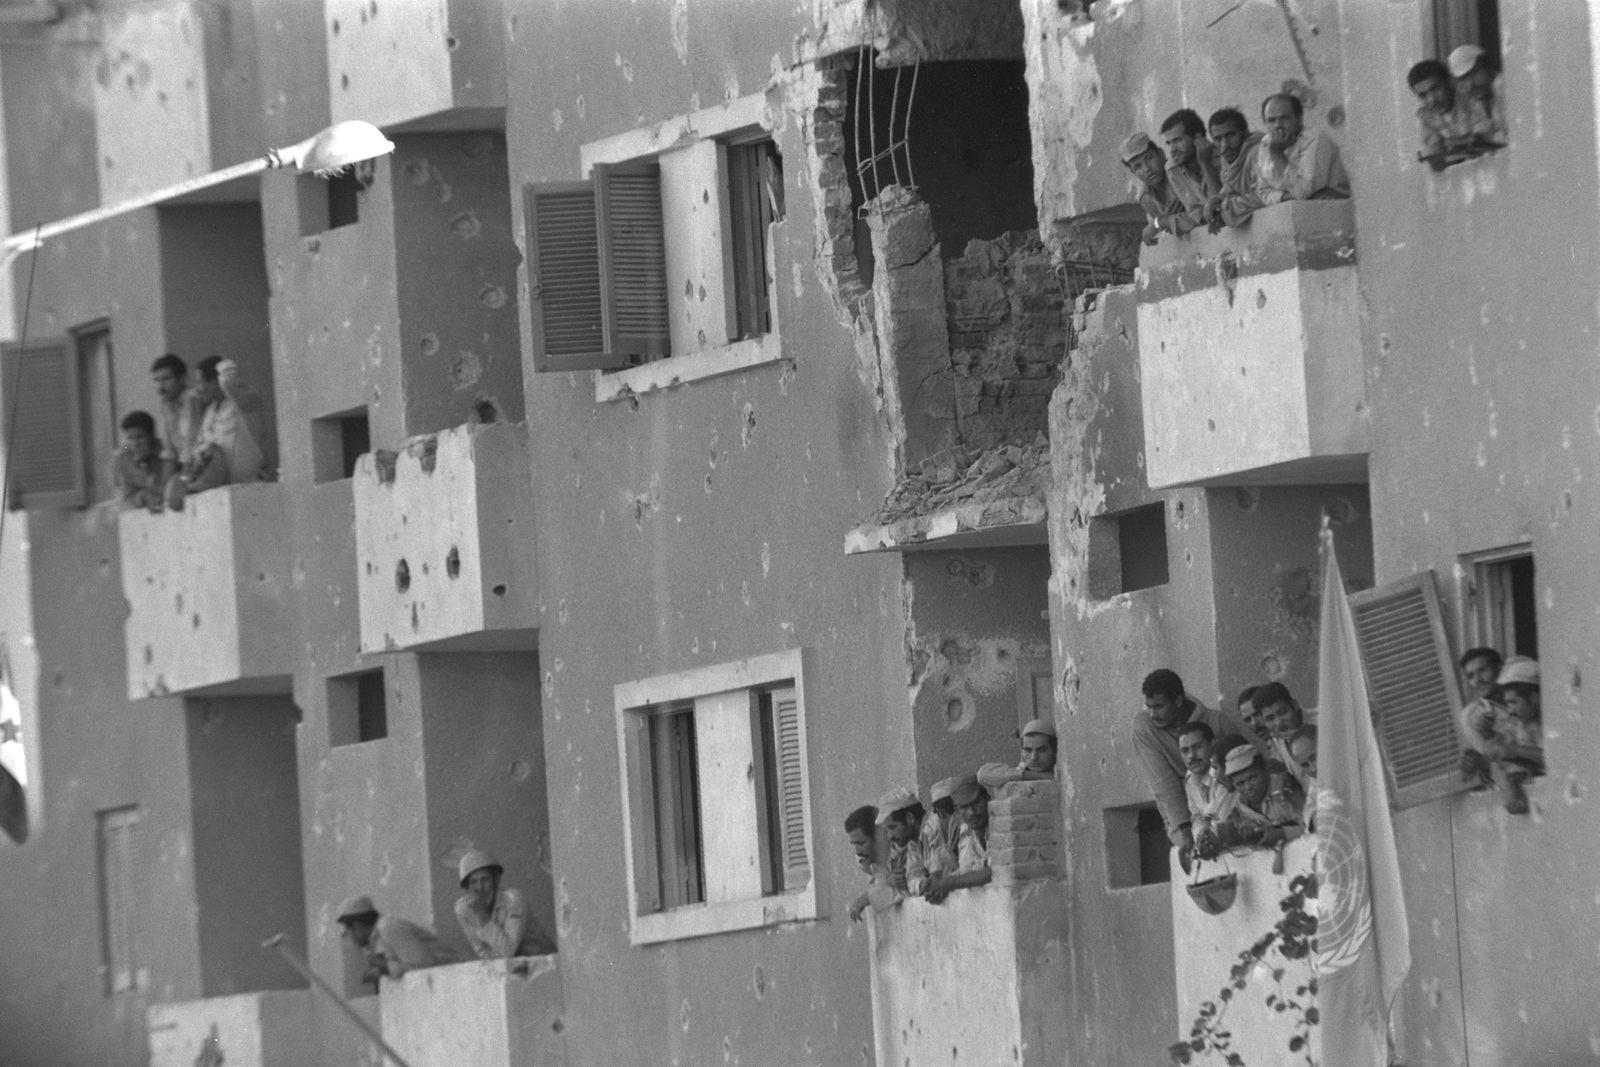 Jom-Kippur-Krieg